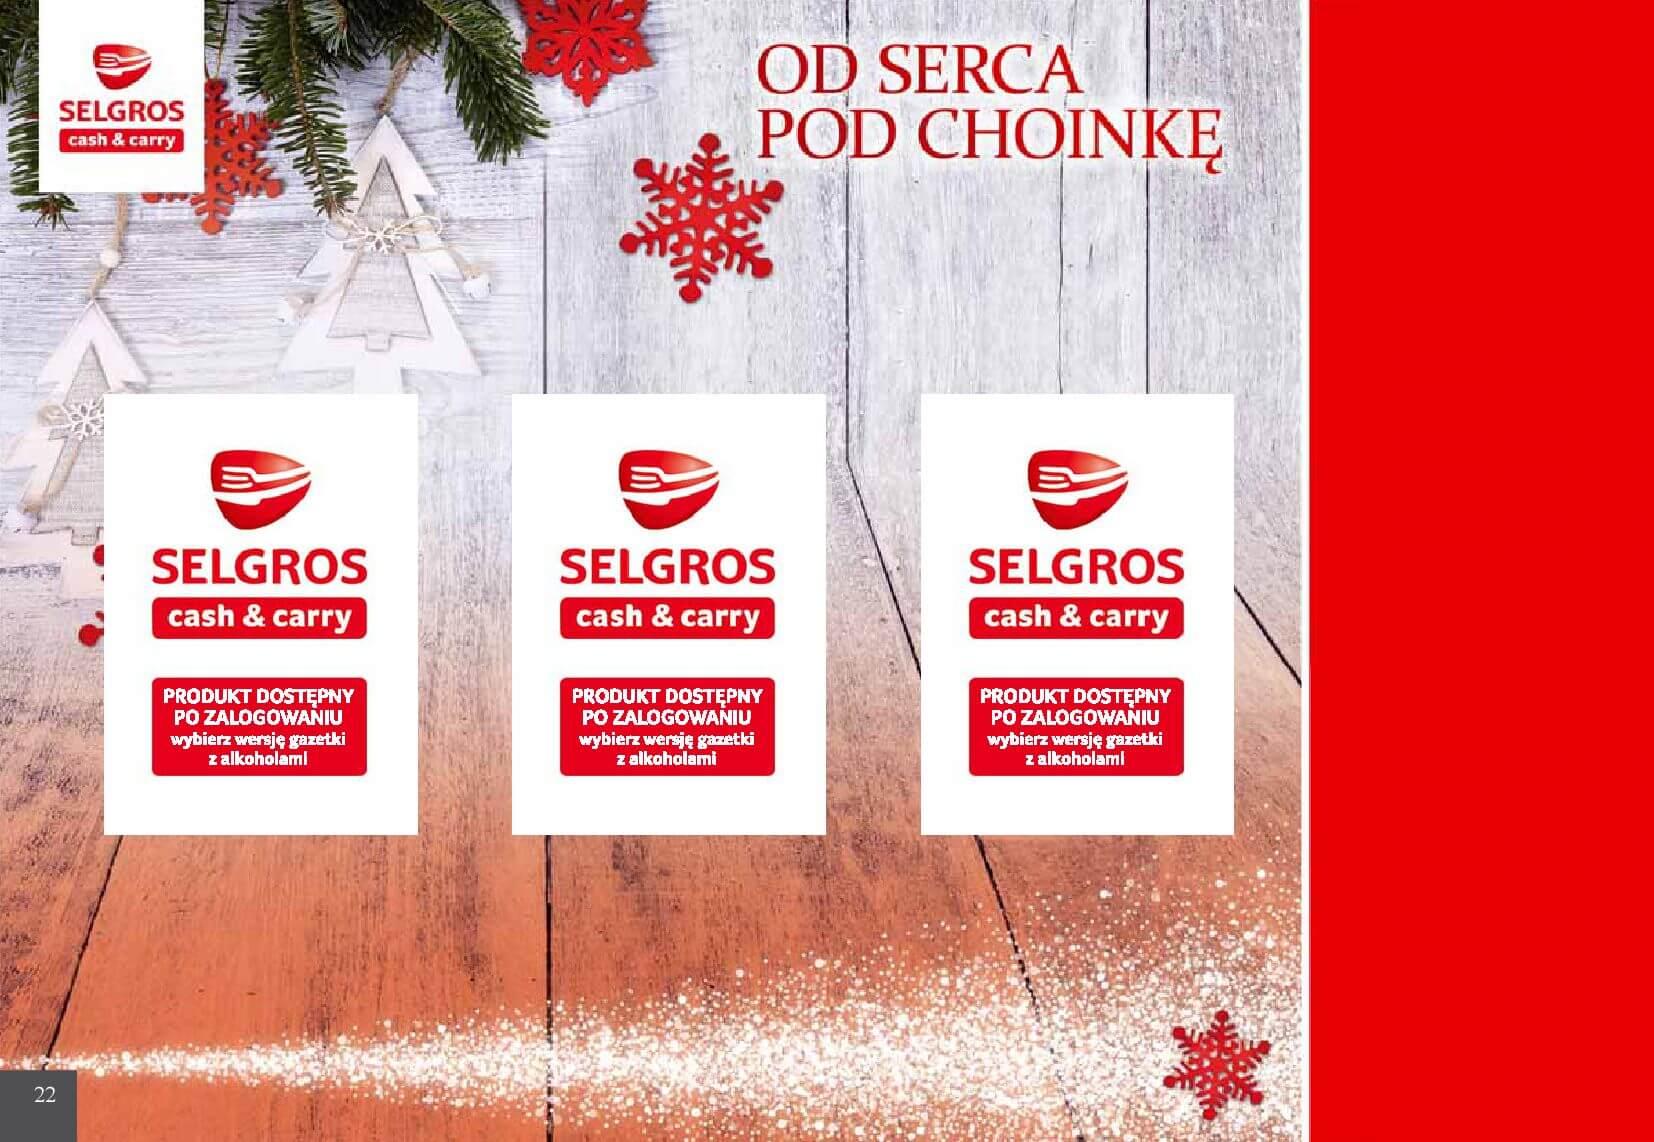 Gazetka Selgros - Od serca pod choinkę-05.12.2018-24.12.2018-page-